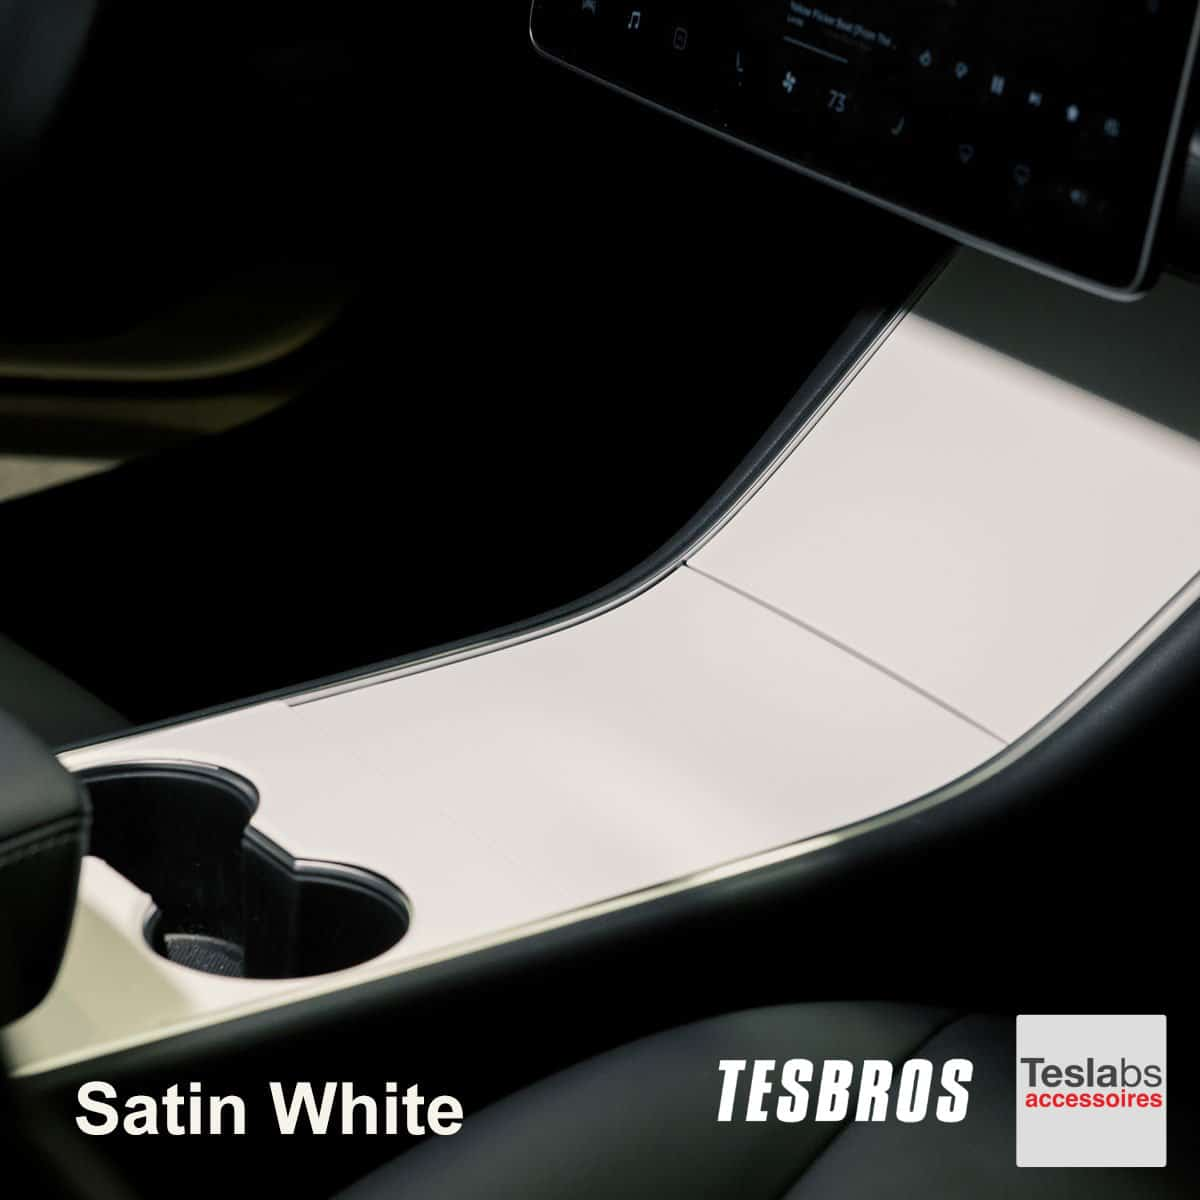 Model 3/Y - Center console wrap satin white